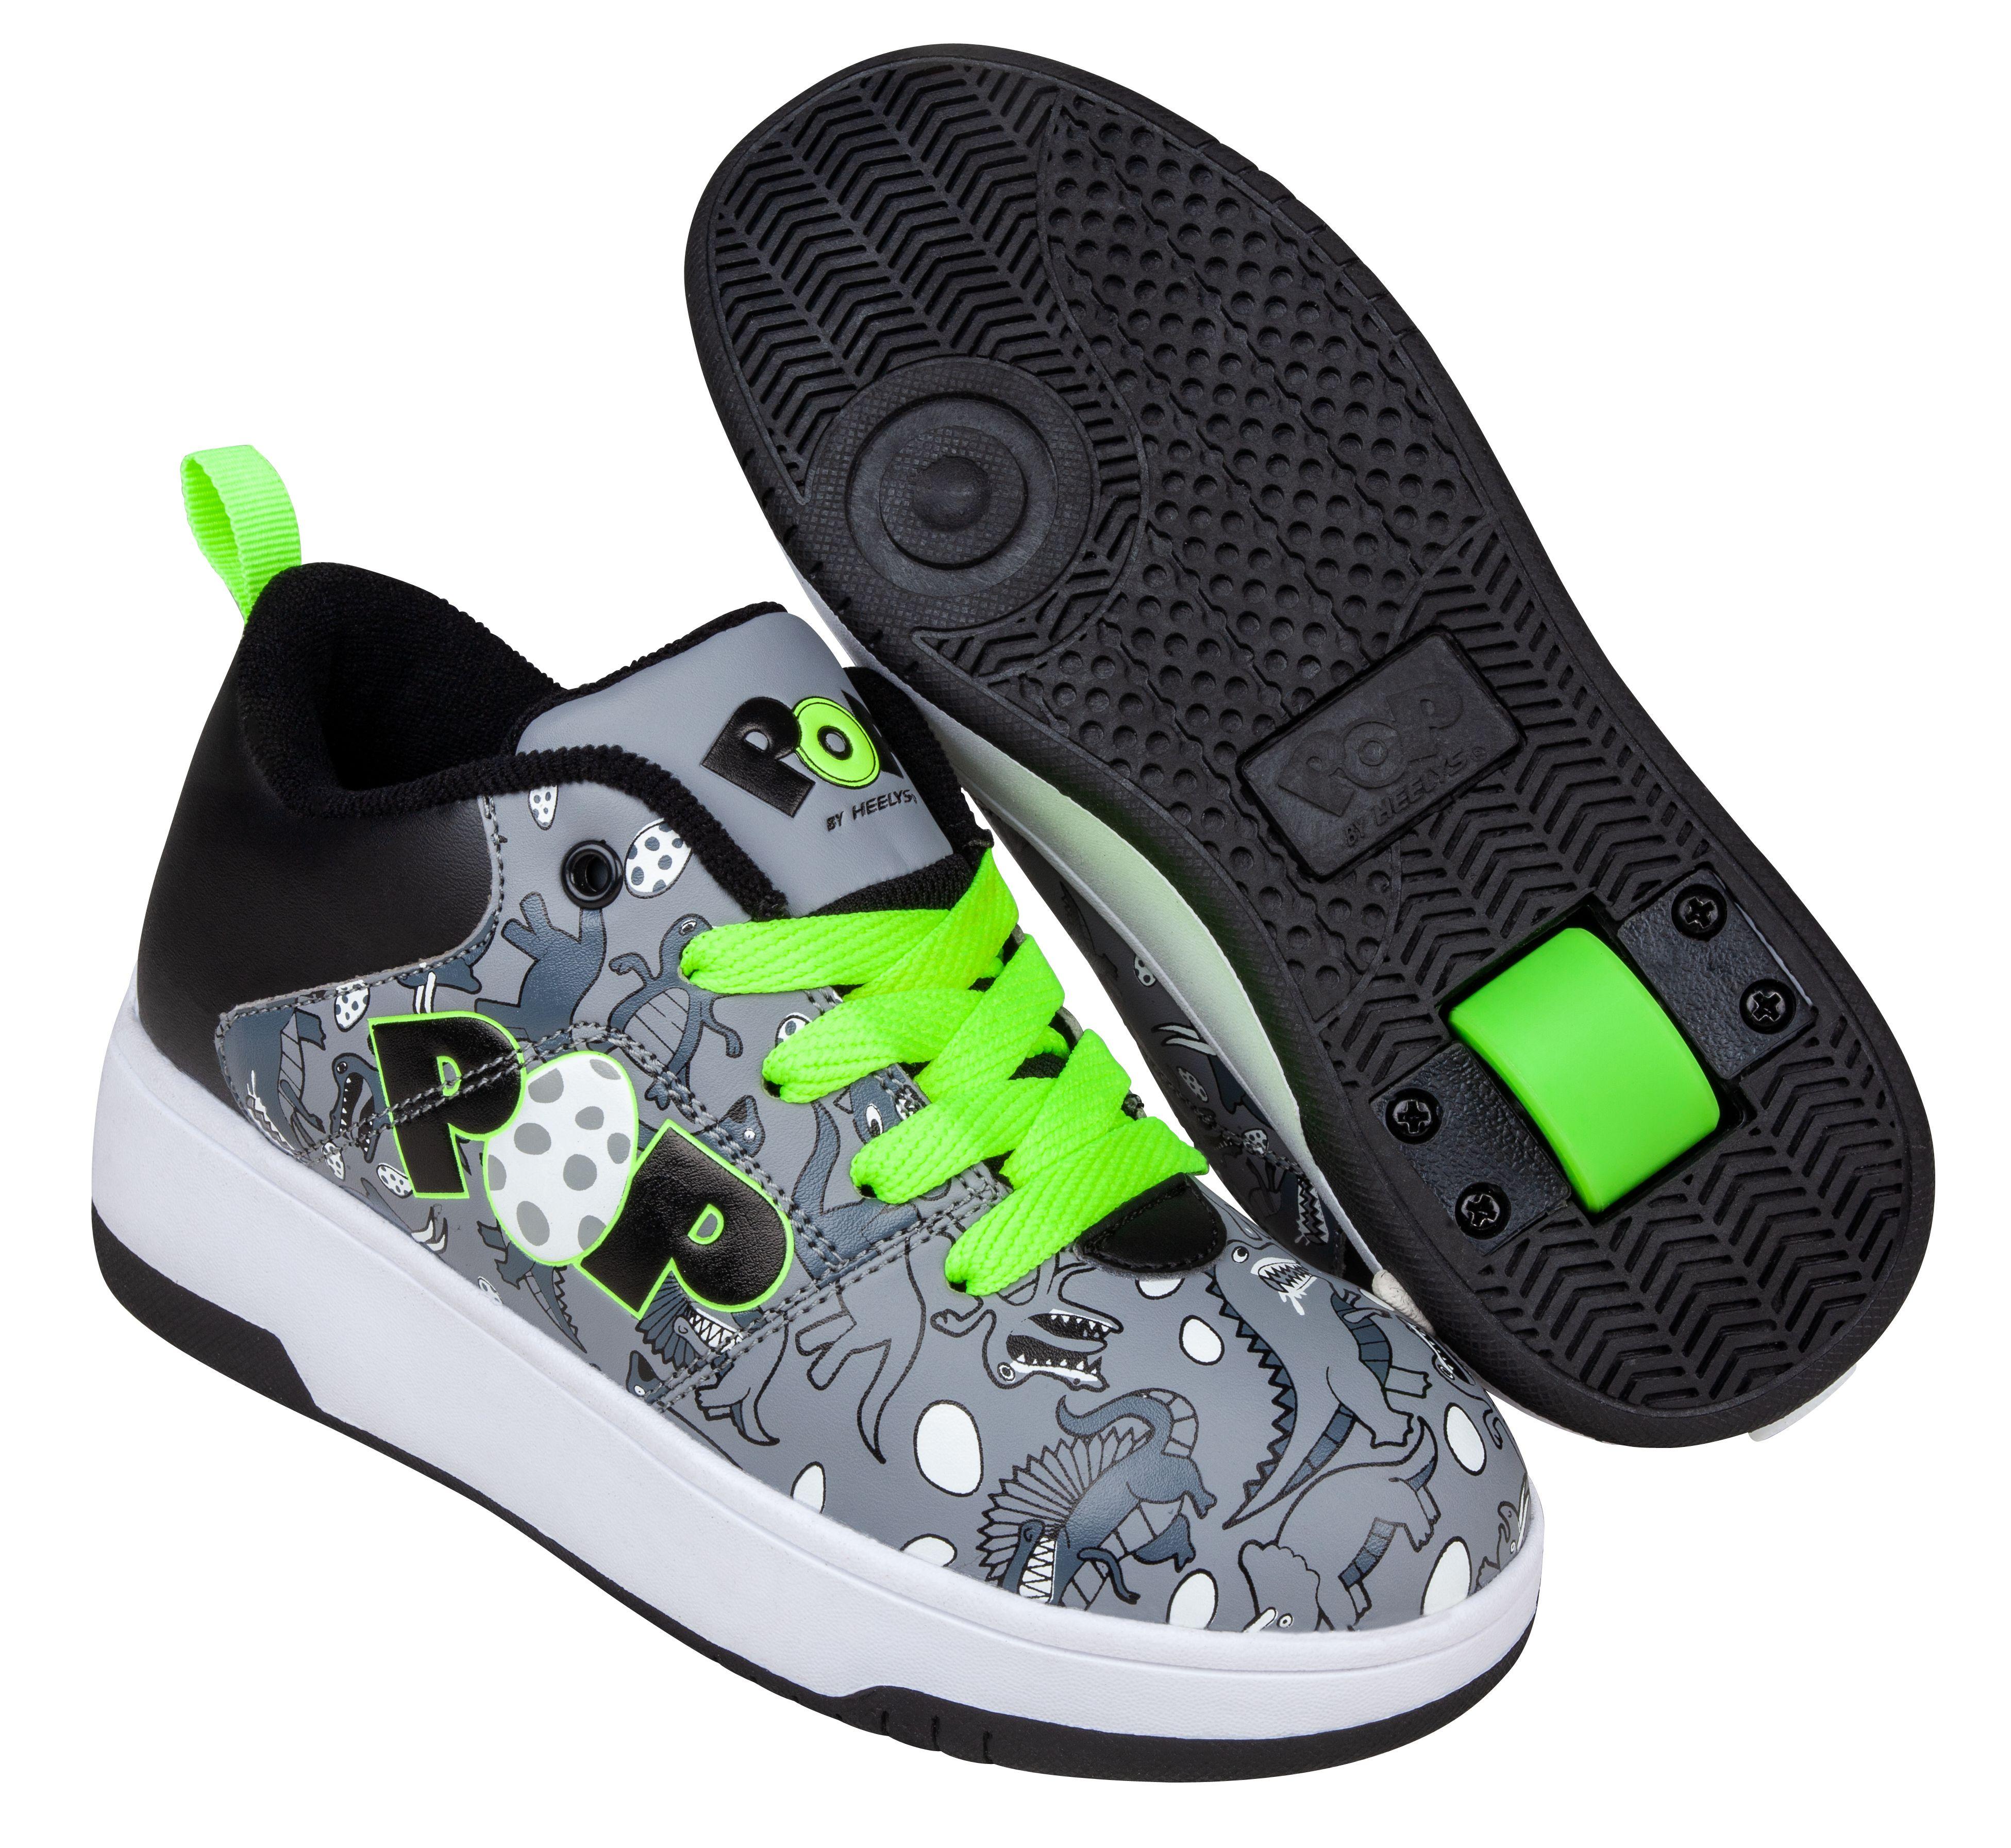 Heelys - POP Shoes - Charcoal (size 30) (POP-B1W-0079)